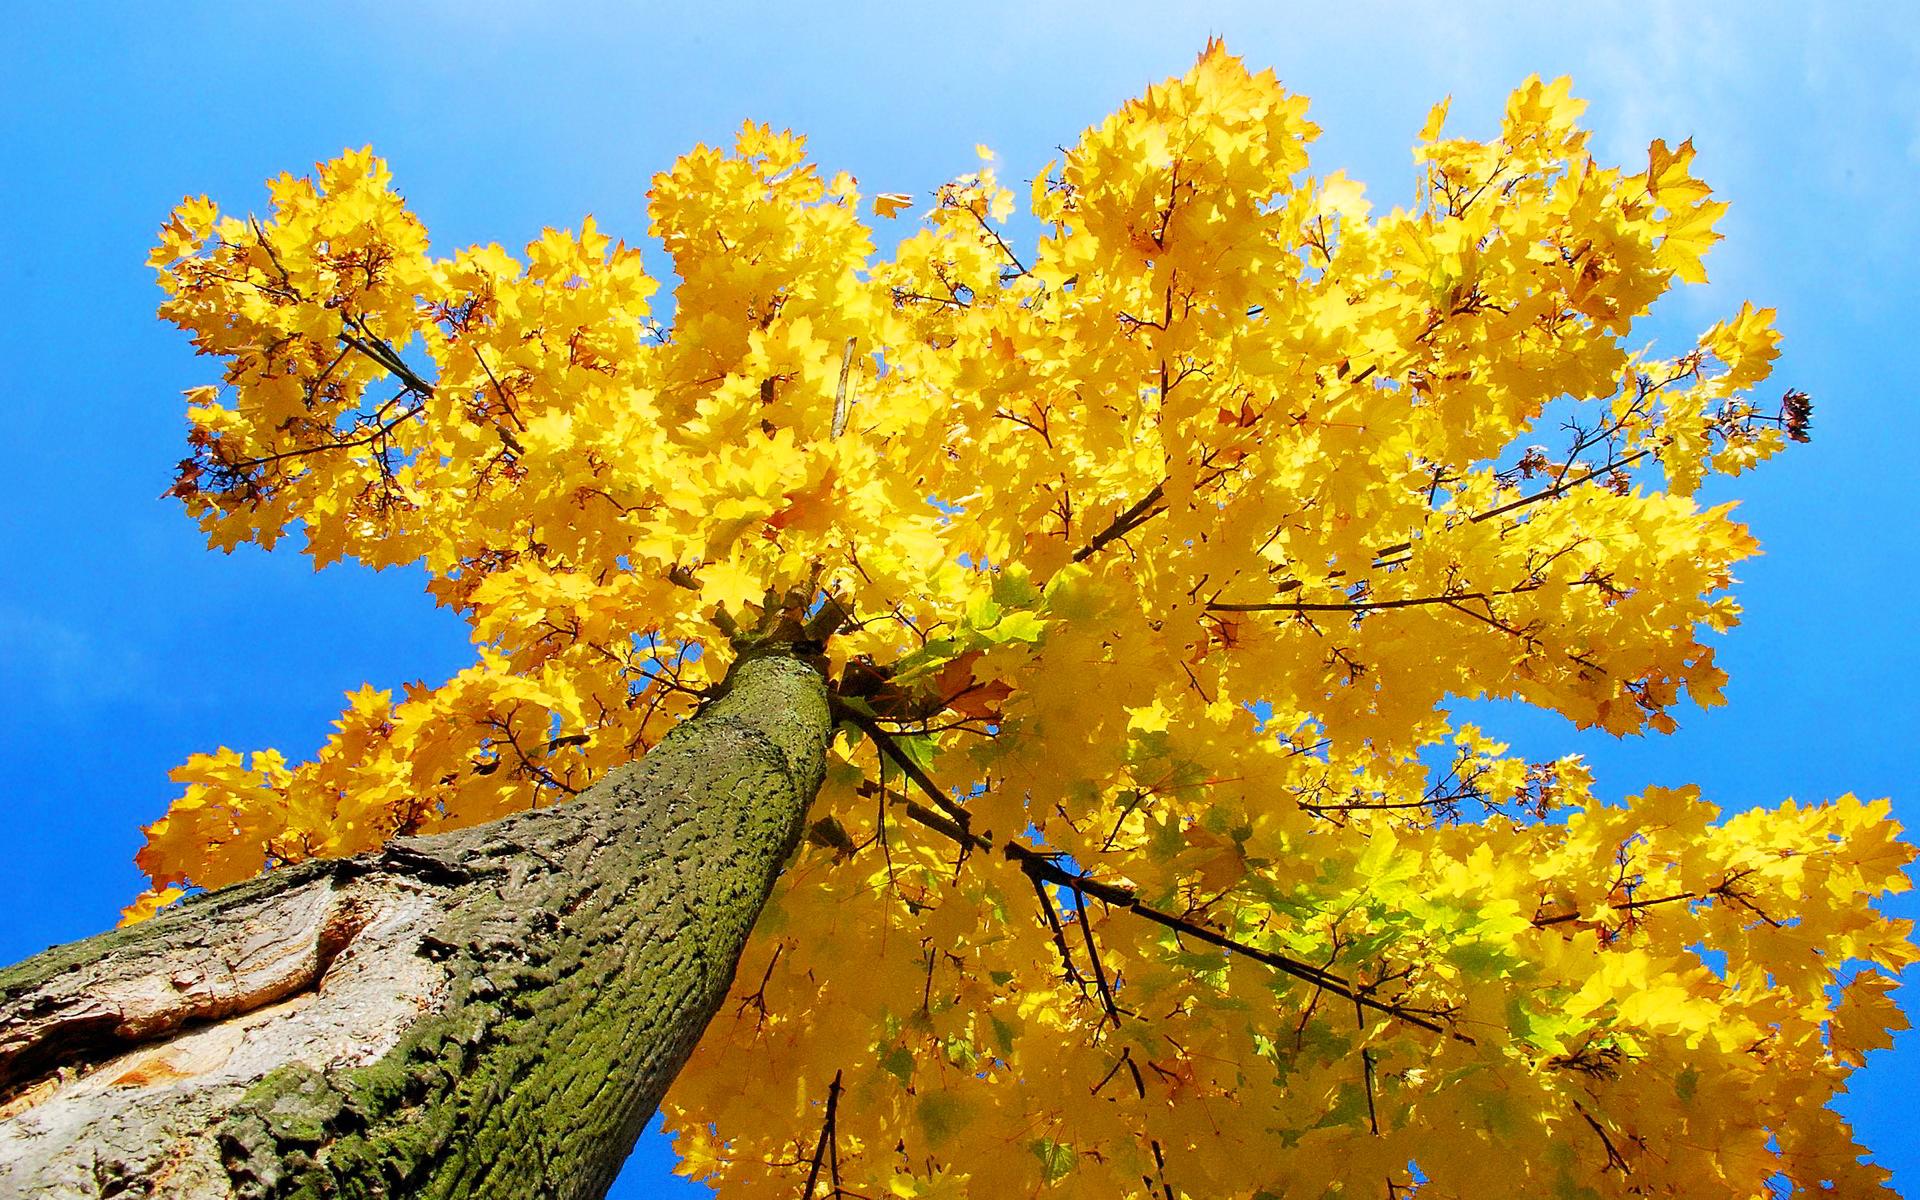 Beautiful Space 3d Live Wallpaper And Screensaver Autumn Yellow Tree Hd Desktop Wallpapers 4k Hd